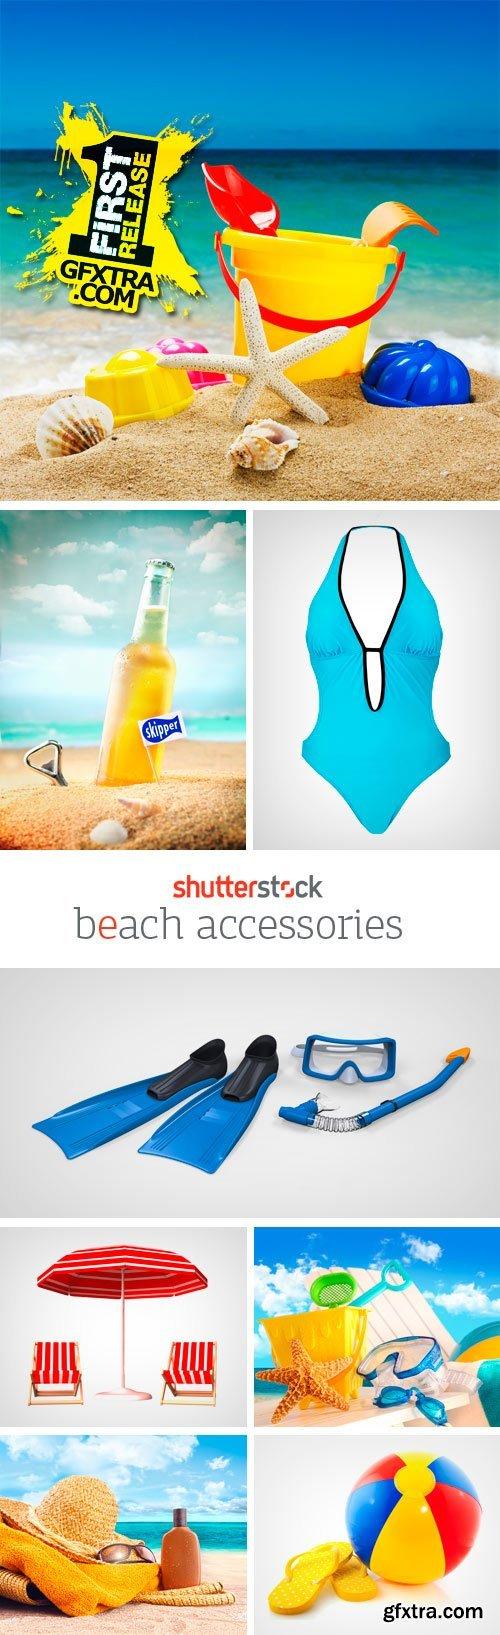 Amazing SS - Beach Accessories, 25xJPGs